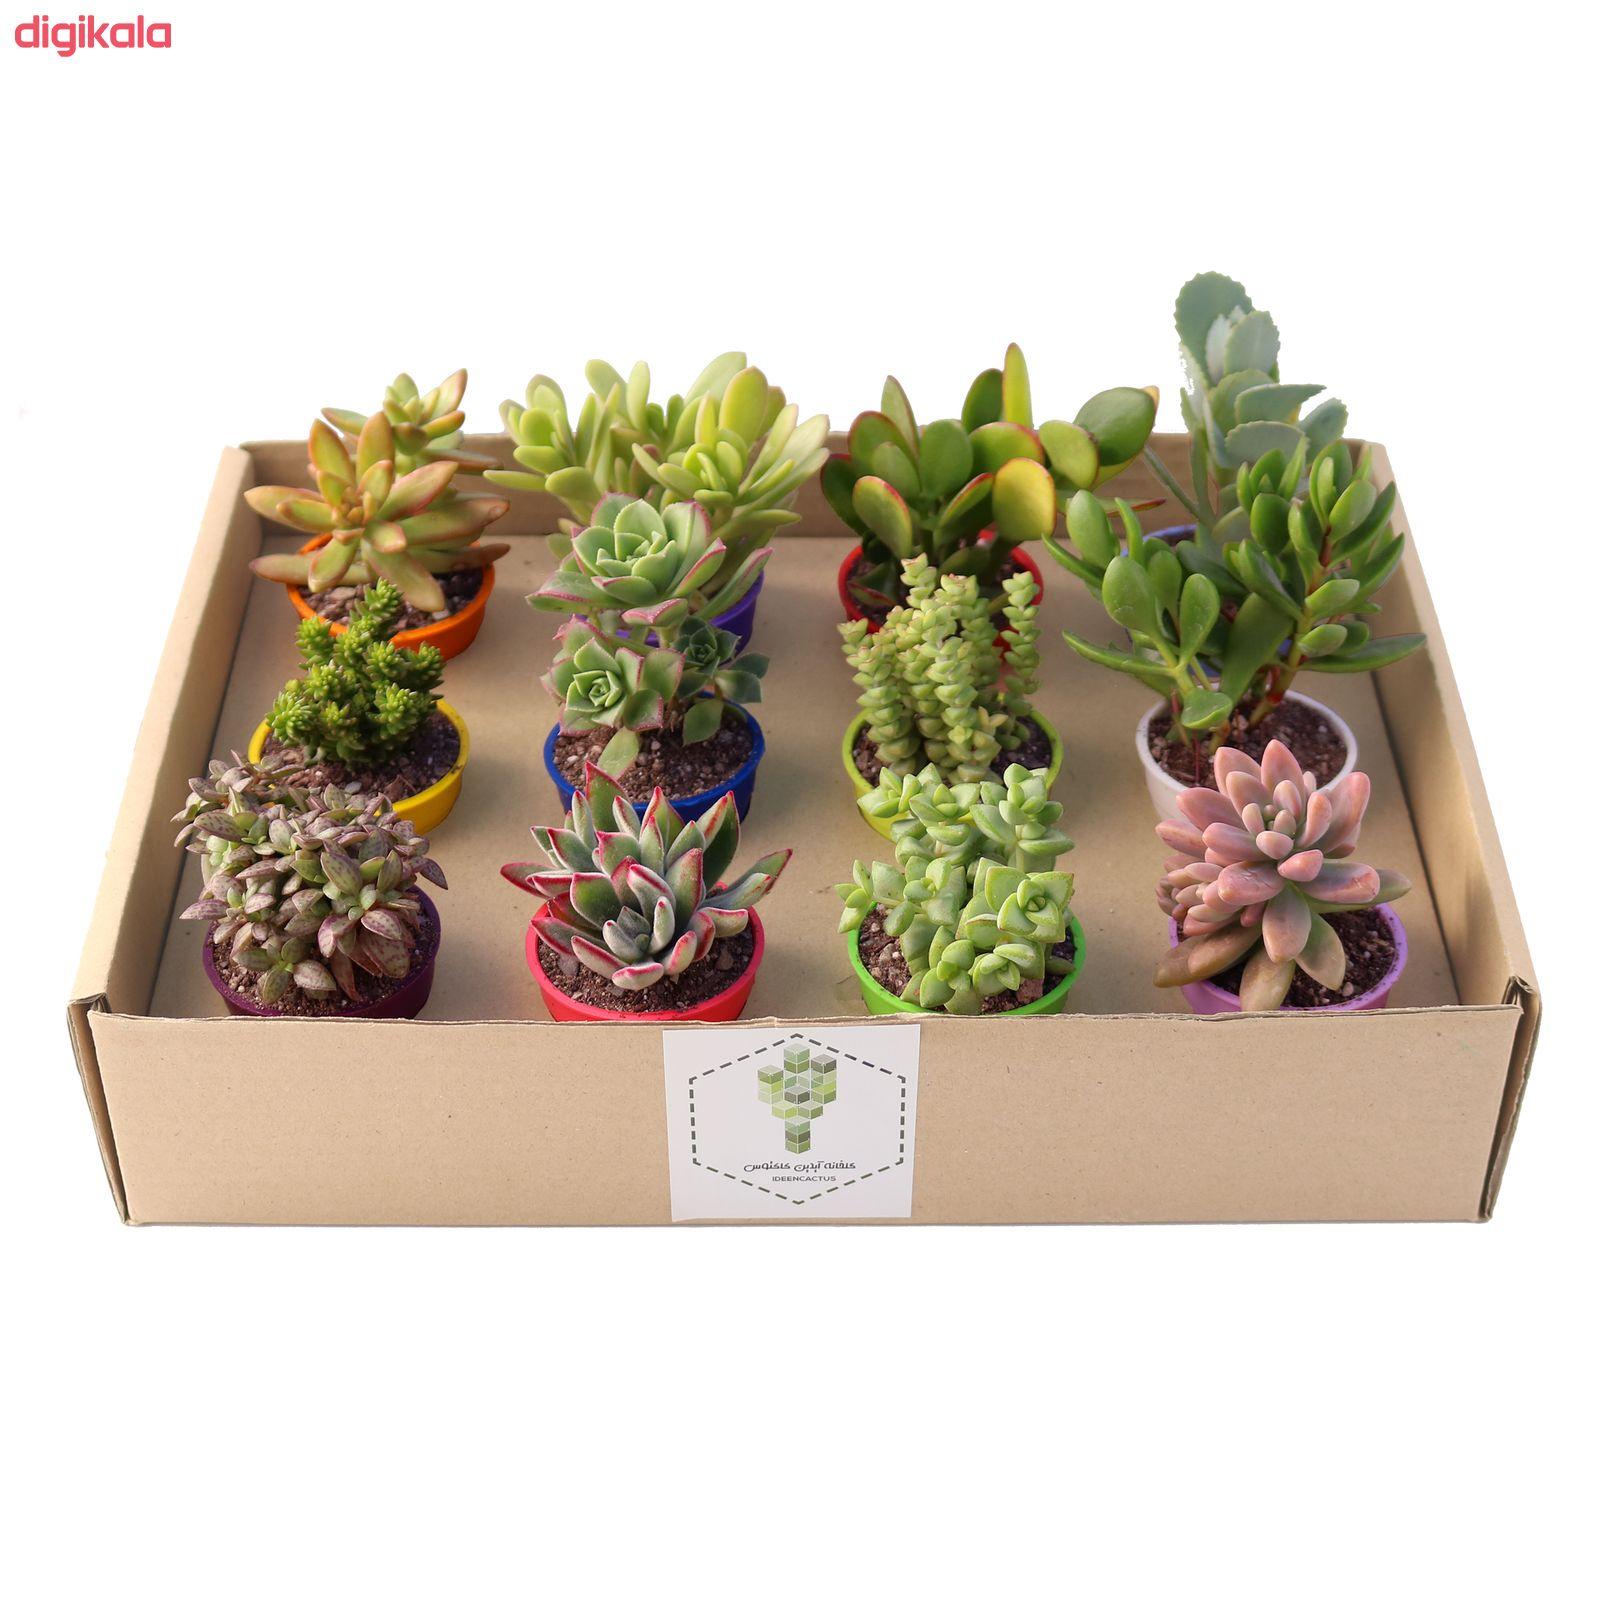 گیاه طبیعی ساکولنت آیدین کاکتوس کد CB-003 بسته 12 عددی main 1 5